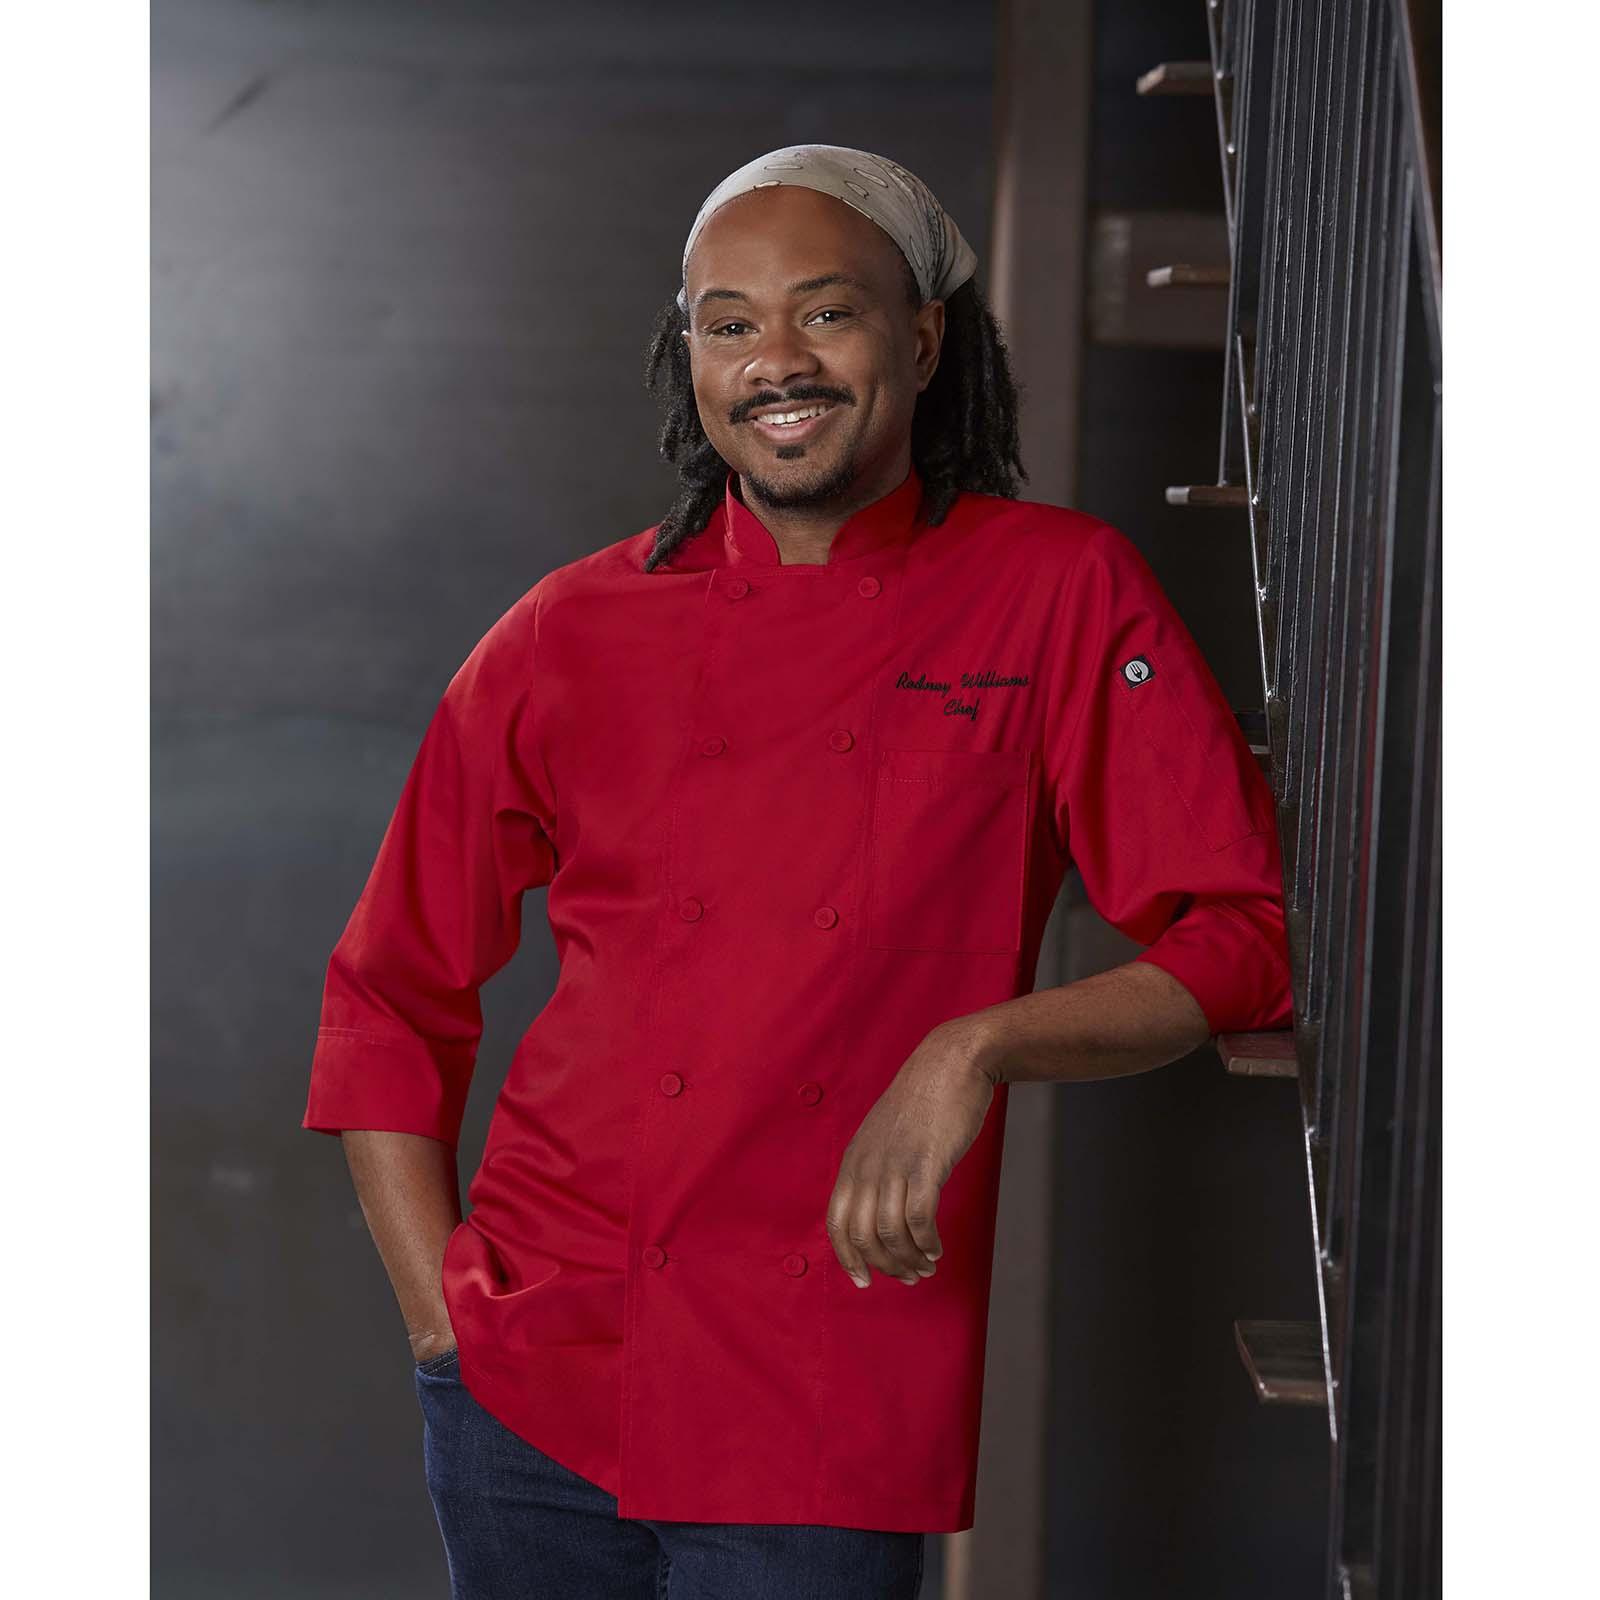 Chef Works JLCLMERXL chef's coat